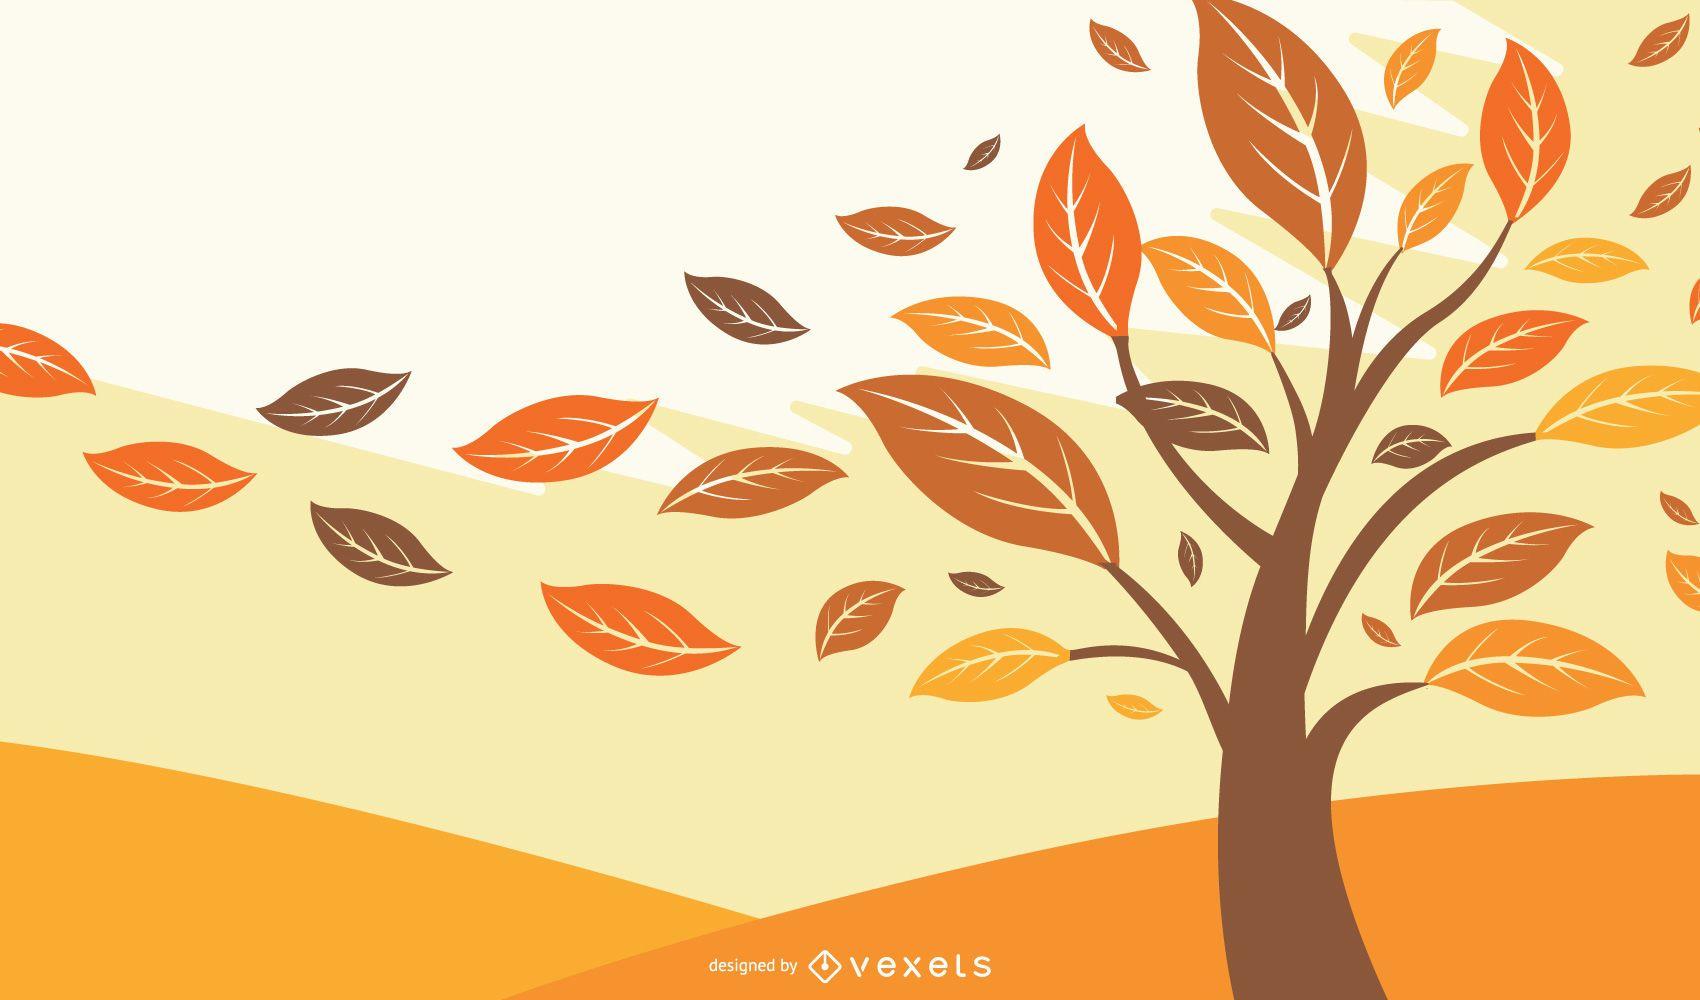 Autumn Falling Leaves Illustration